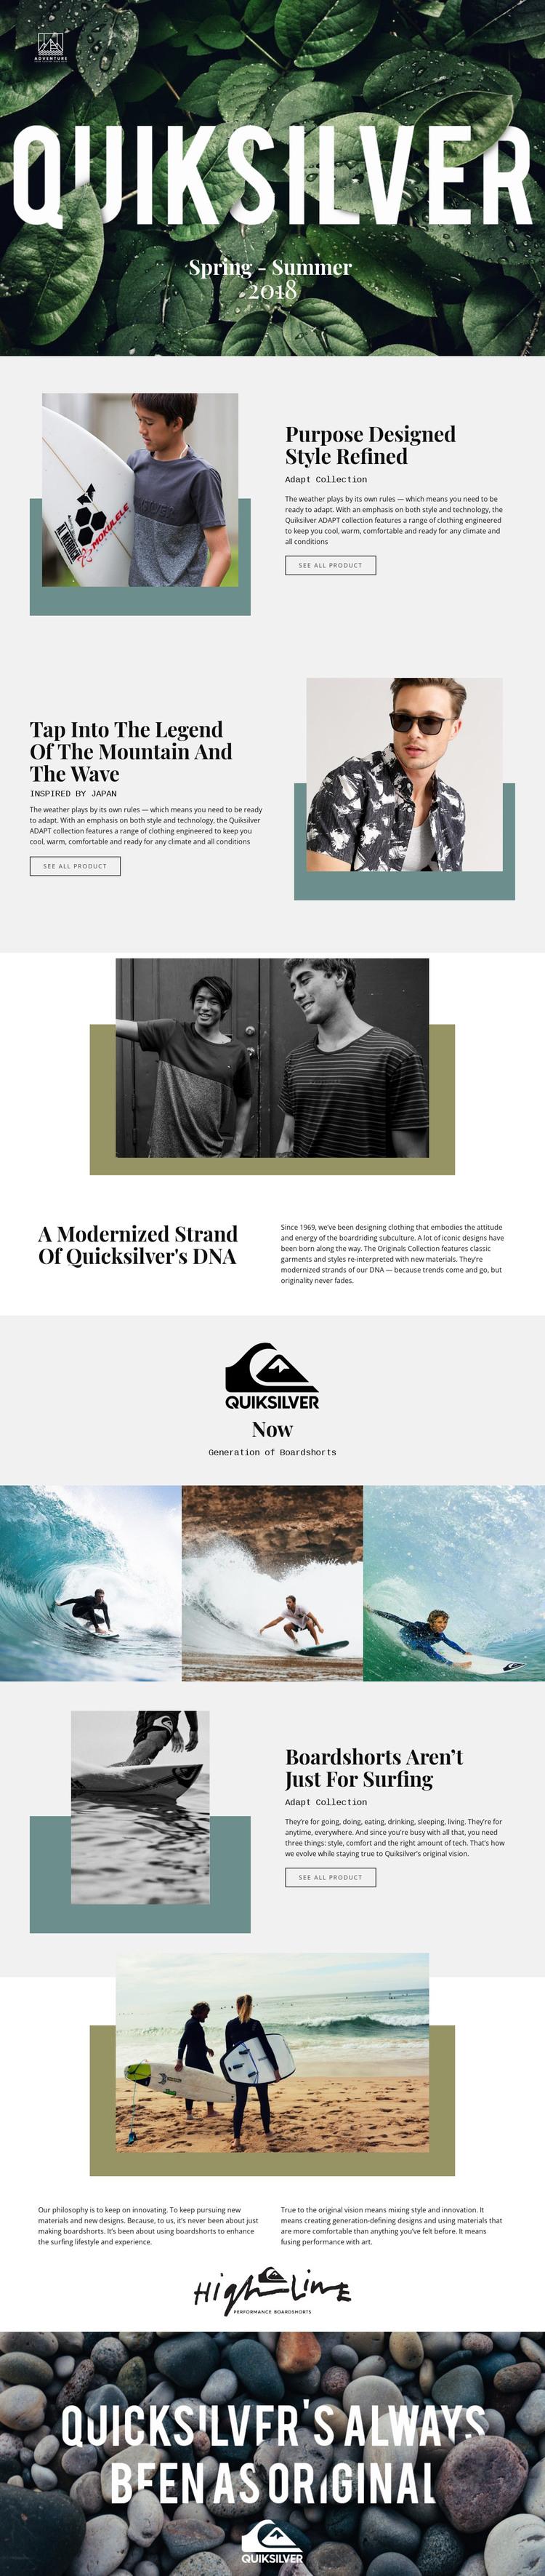 Quiksilver Web Design